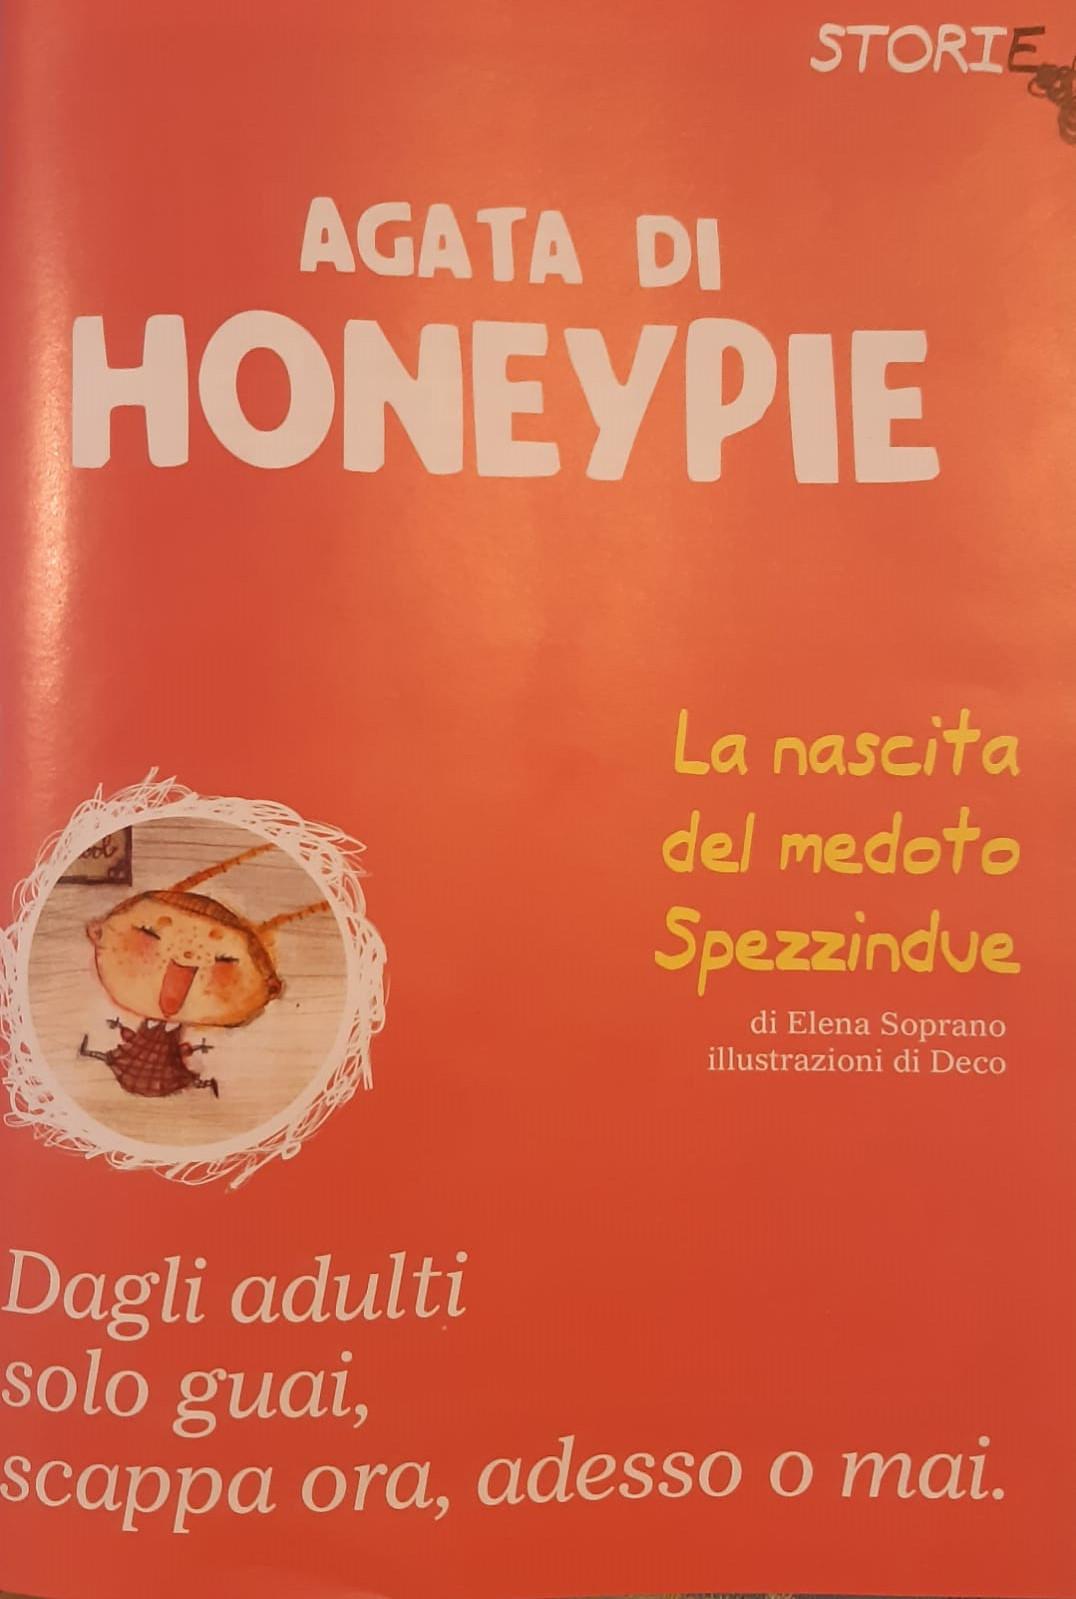 Agata di Honeypie 3